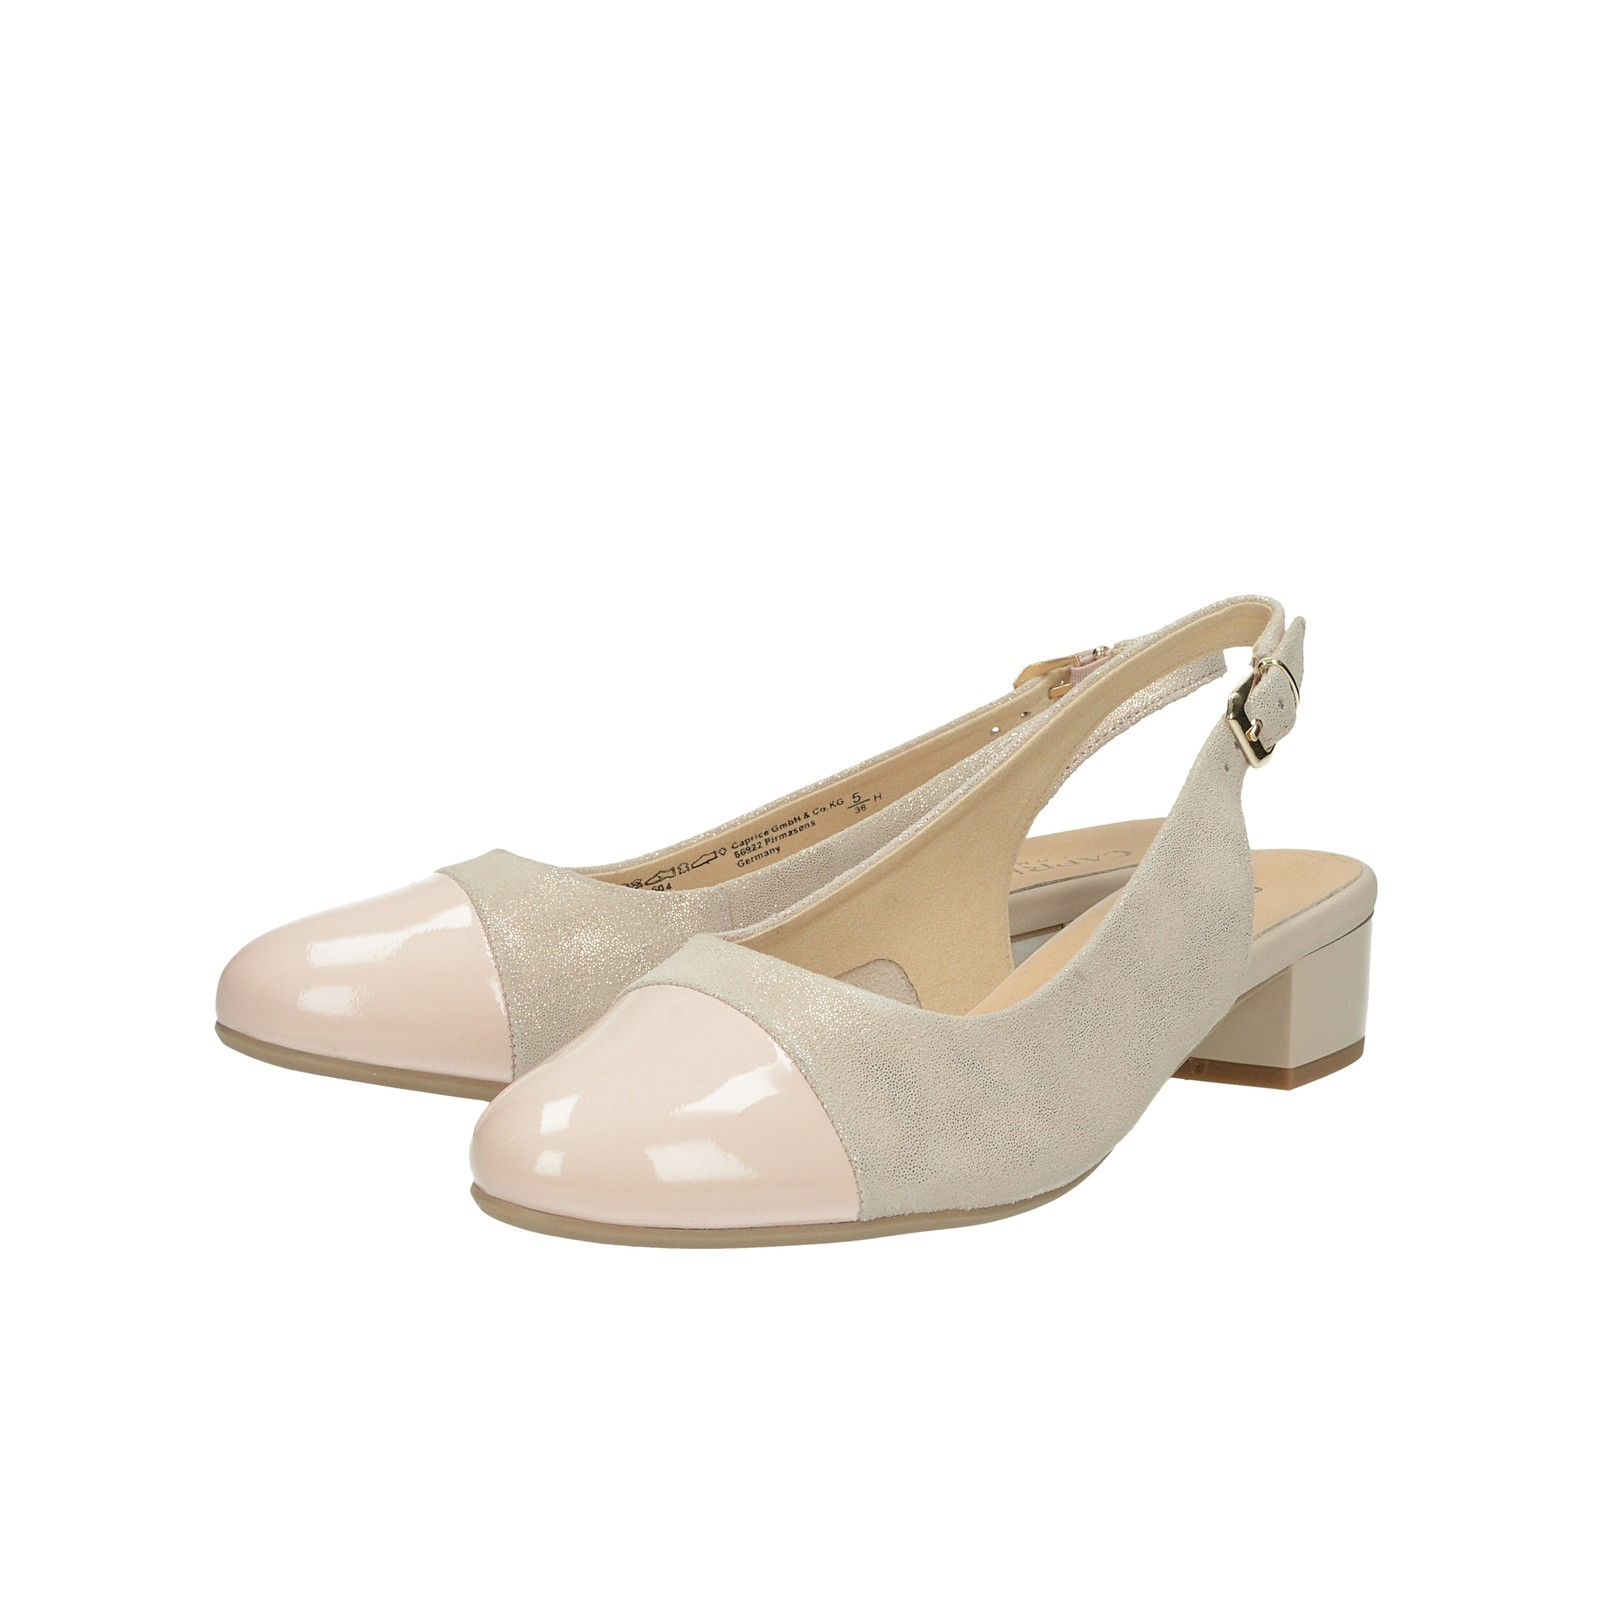 40a9f86ee Caprice dámske kožené sandále - ružové   2950222-ROSE www.robel.sk